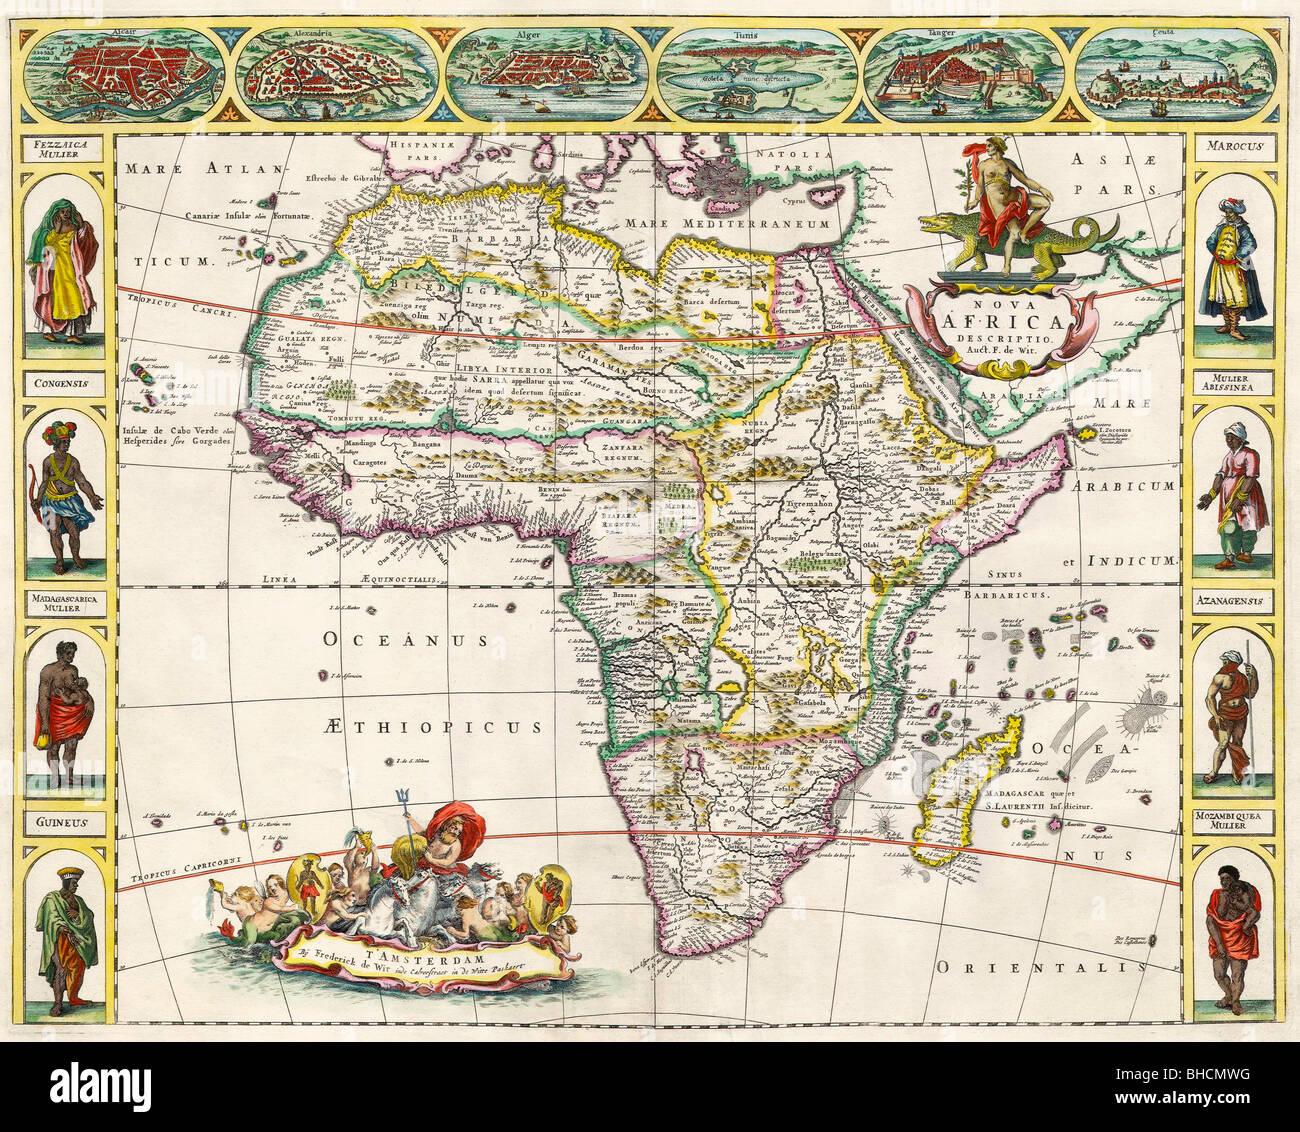 Map of Africa in the 17th century. Nova Africa Descriptio